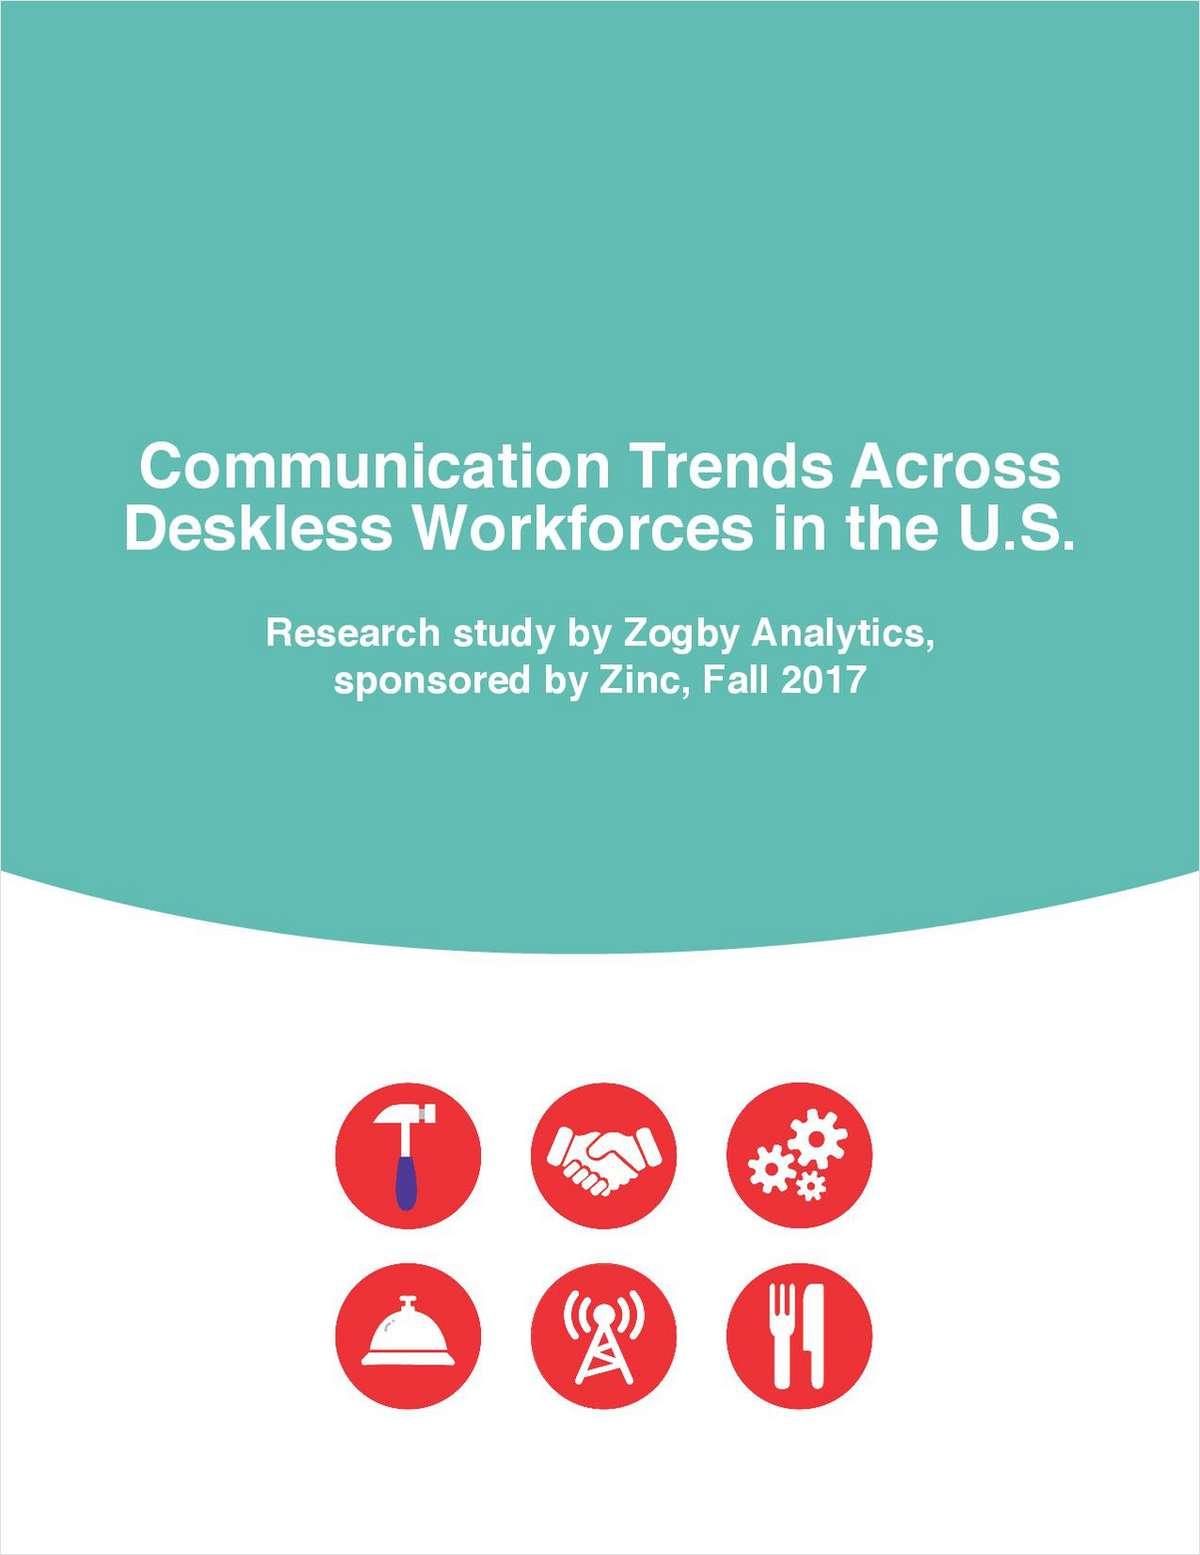 Communication Trends Across Deskless Workforces in the U.S.